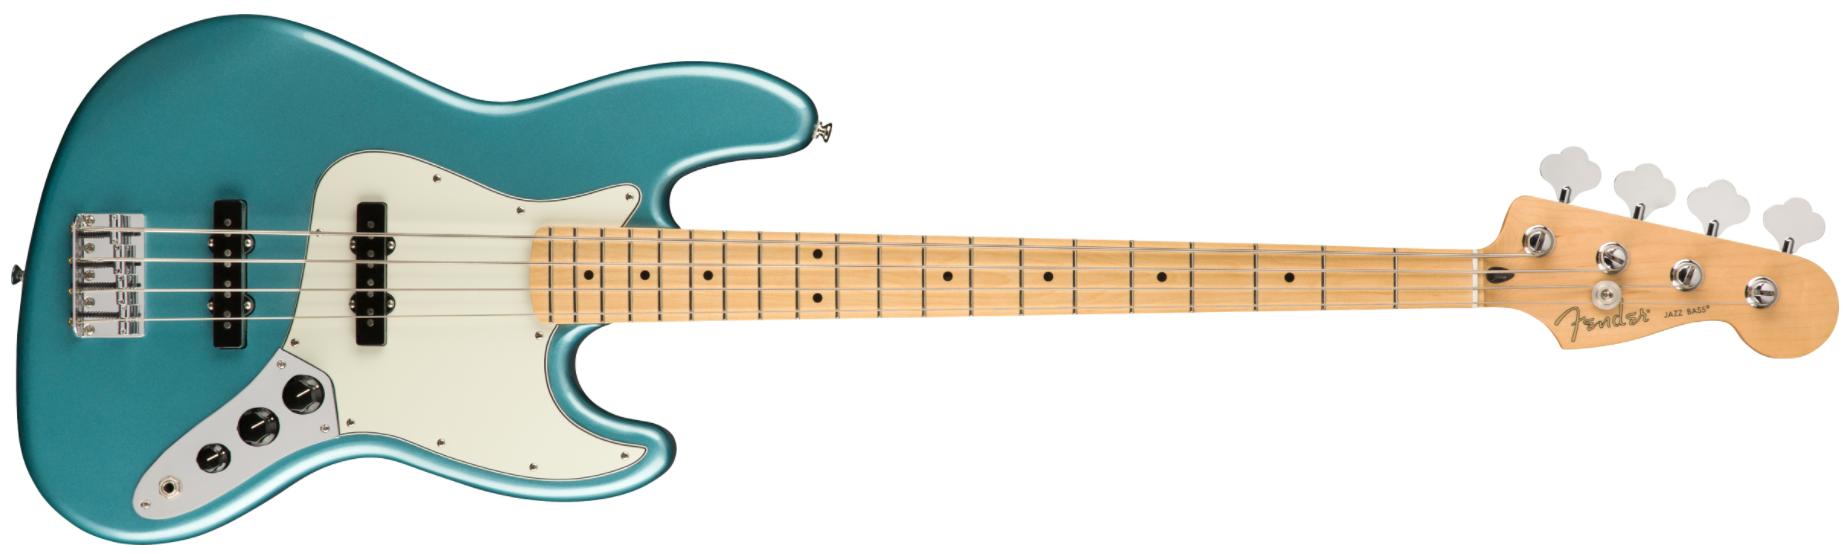 Fender Player Jazz Bass, MN, Tidepool